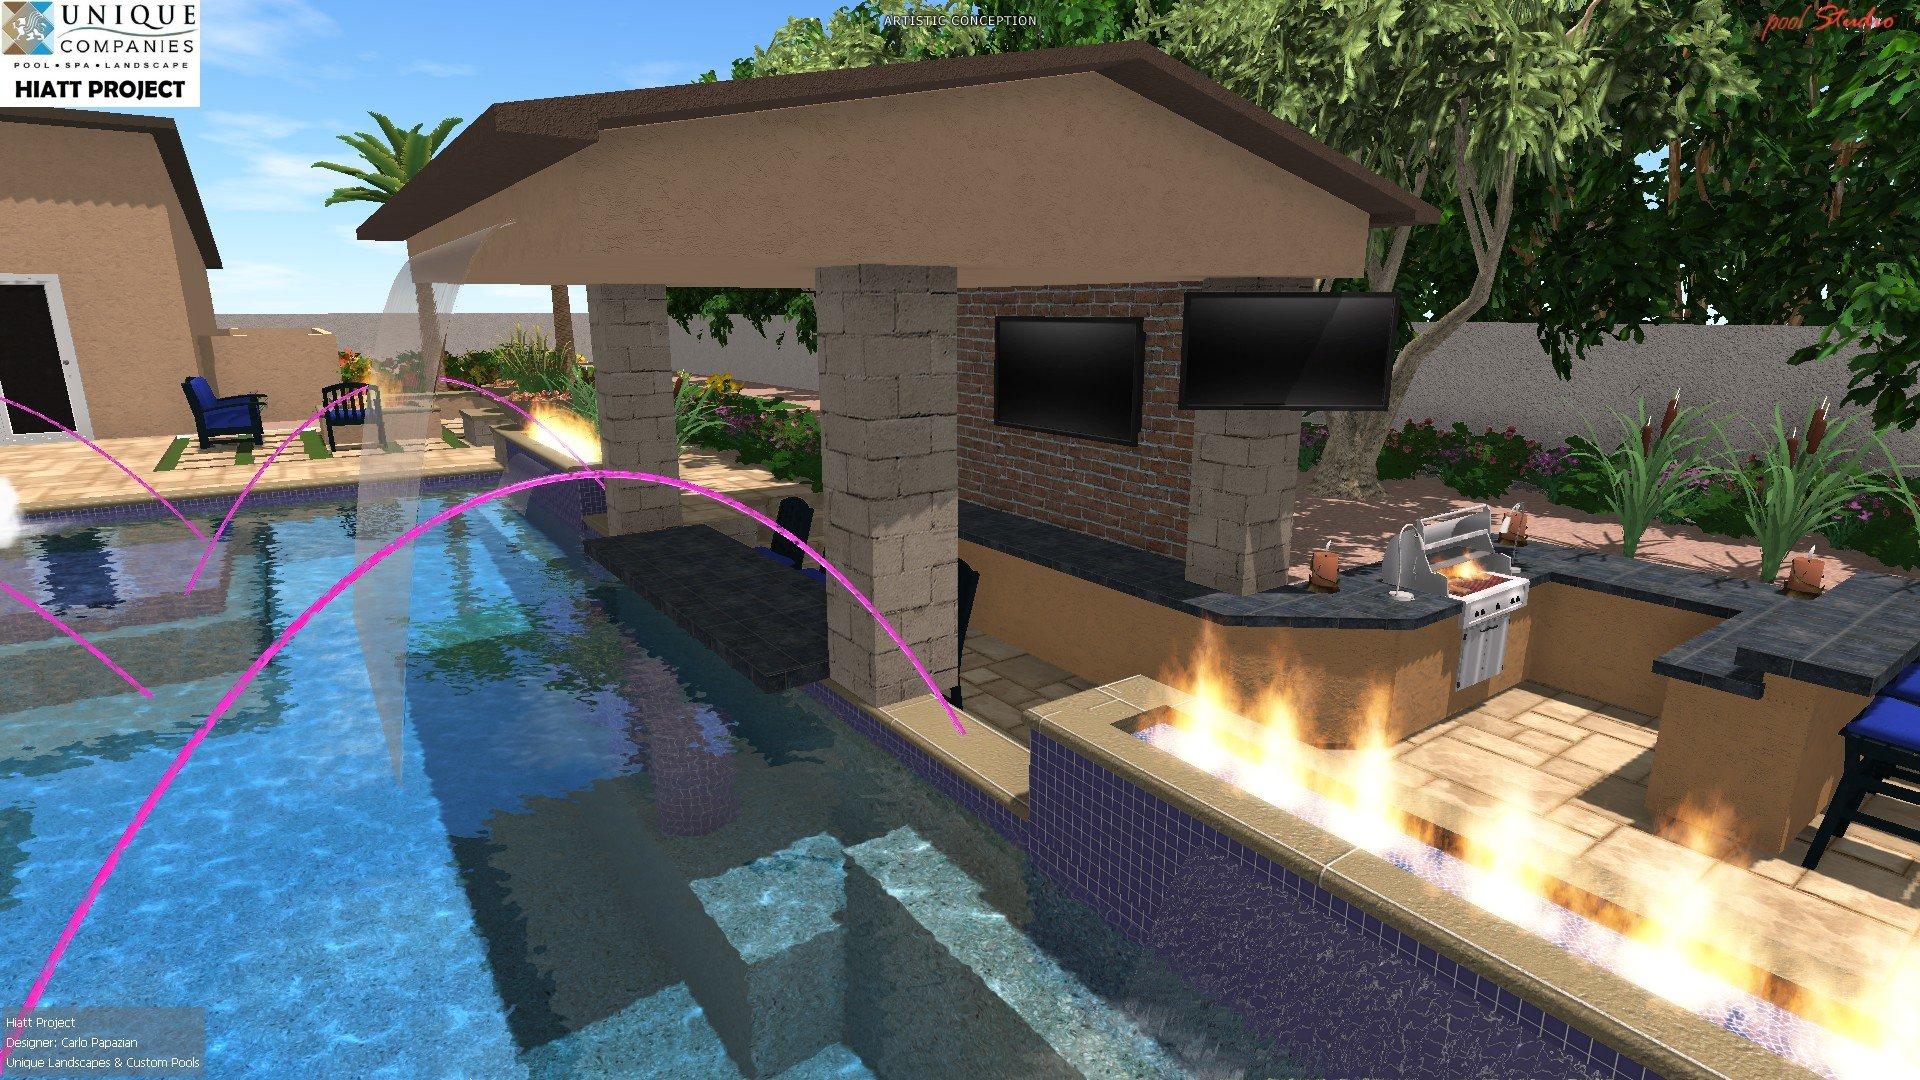 Client designs hiatt phoenix landscaping design pool for Pool design with swim up bar